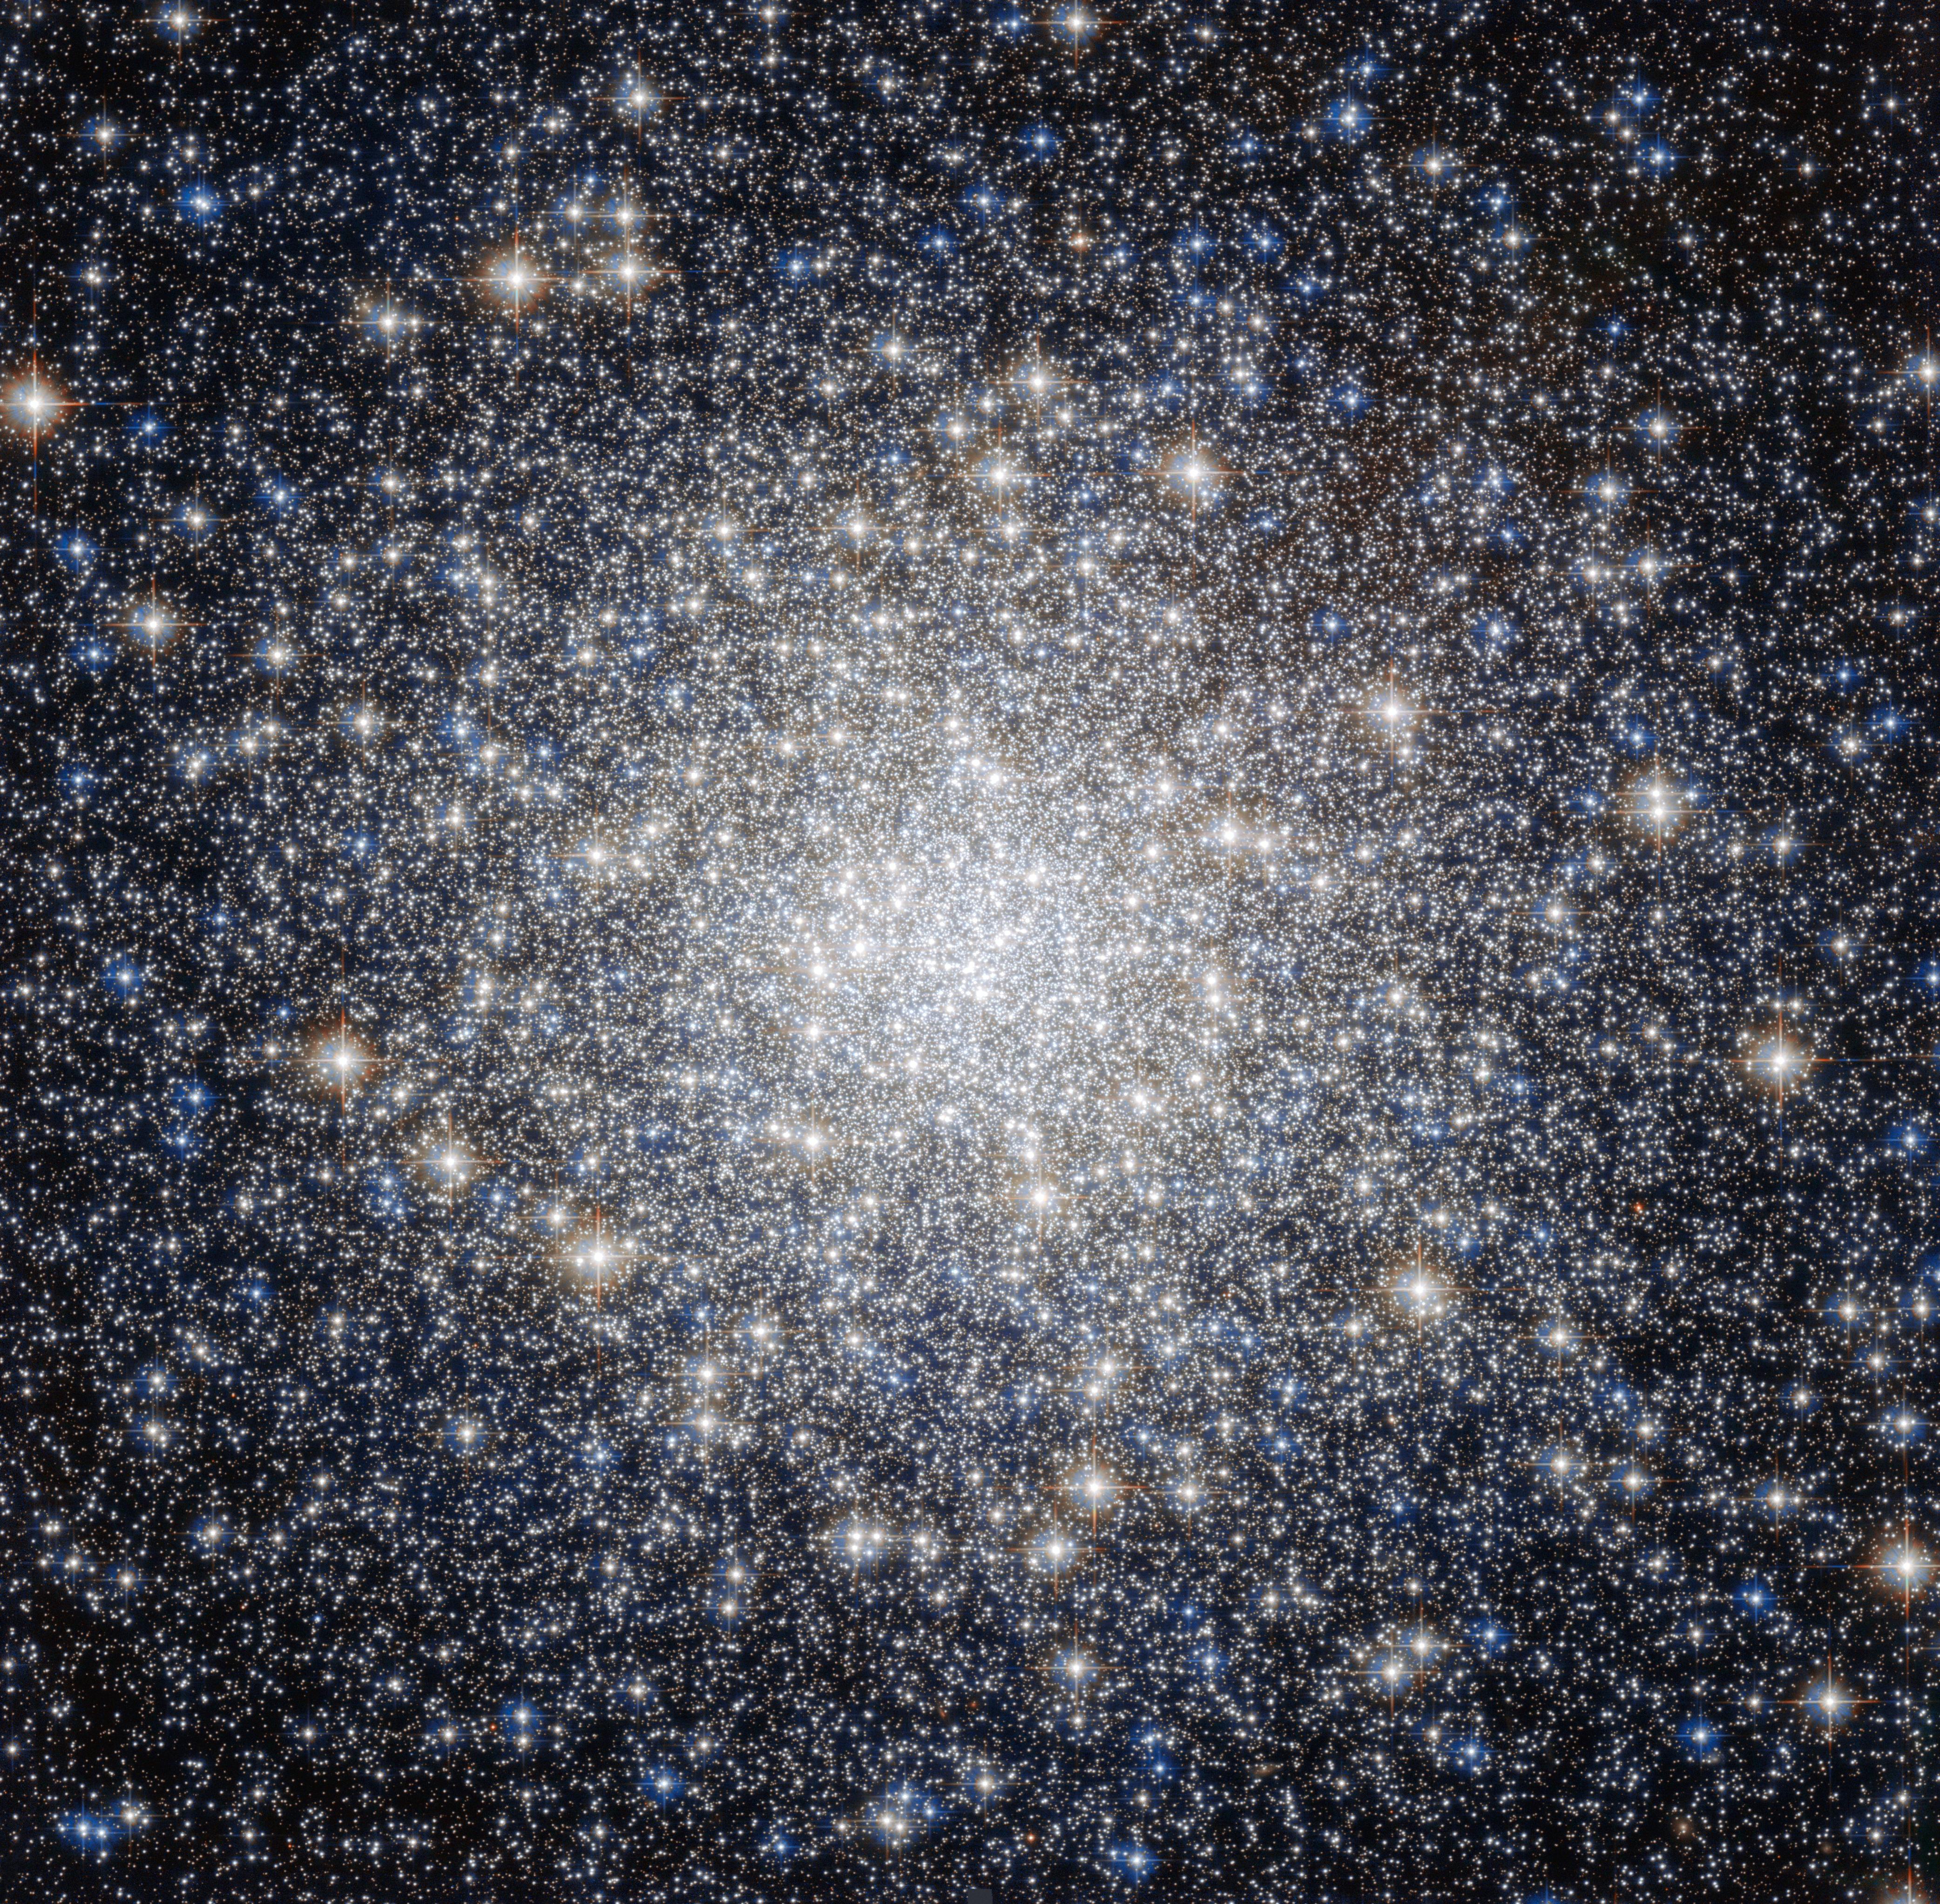 HUBBLE'S TOP 100 • #95 • Credit: ESA/Hubble & NASA